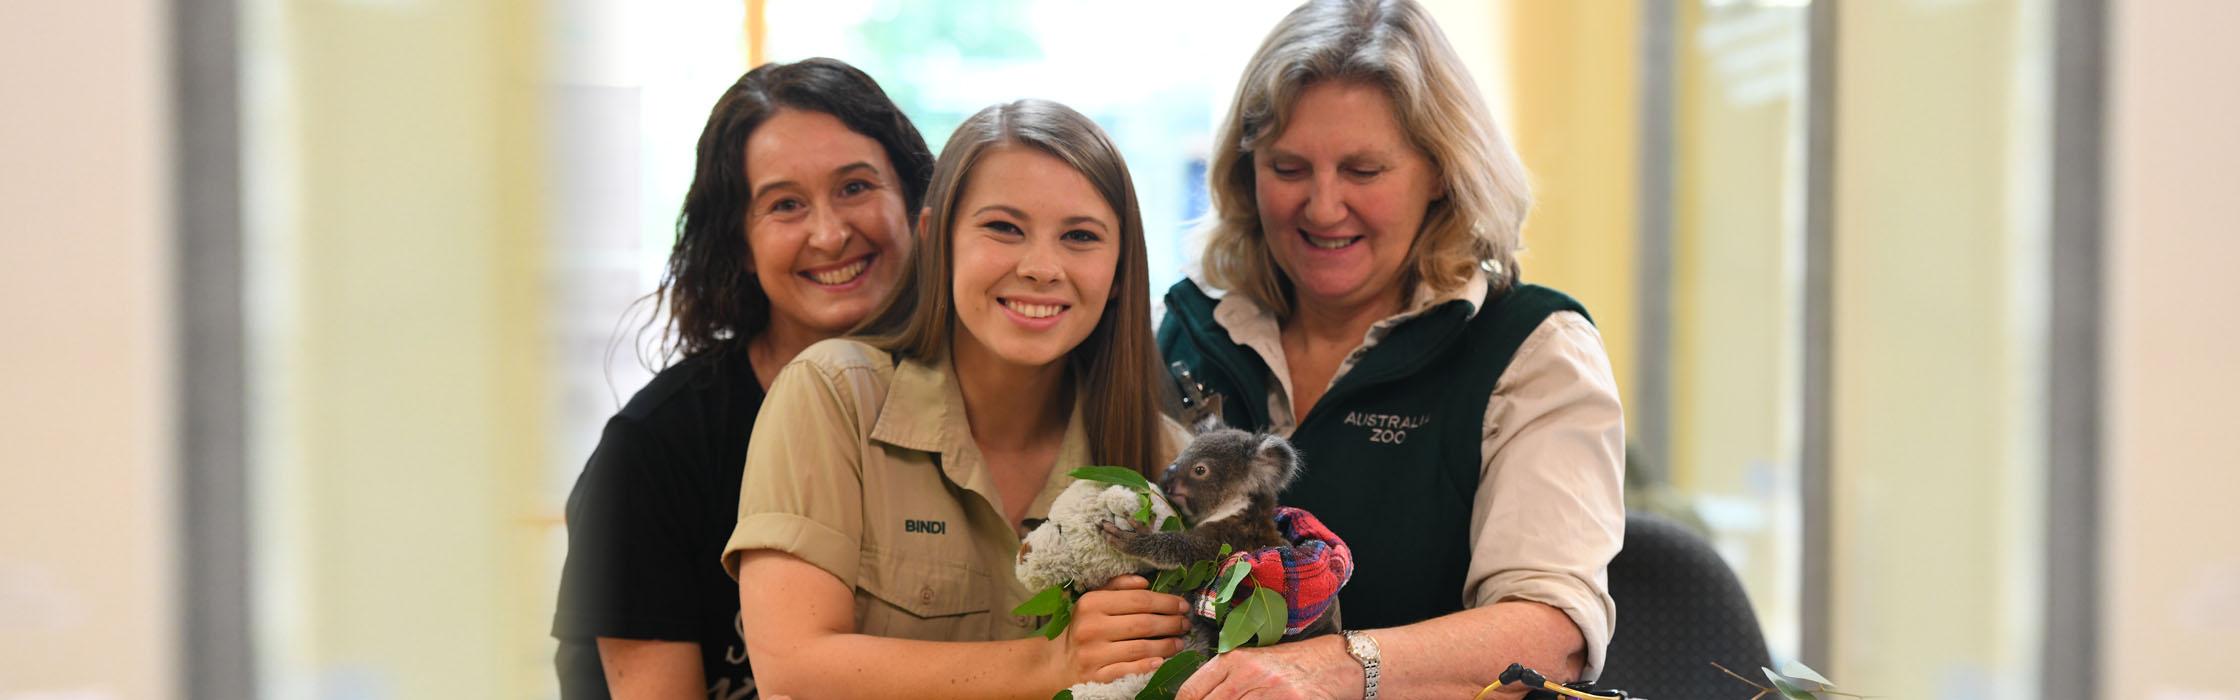 Experiences - Animal Encounters - Australia Zoo Wildlife Hospital Sneak Peek2240x700